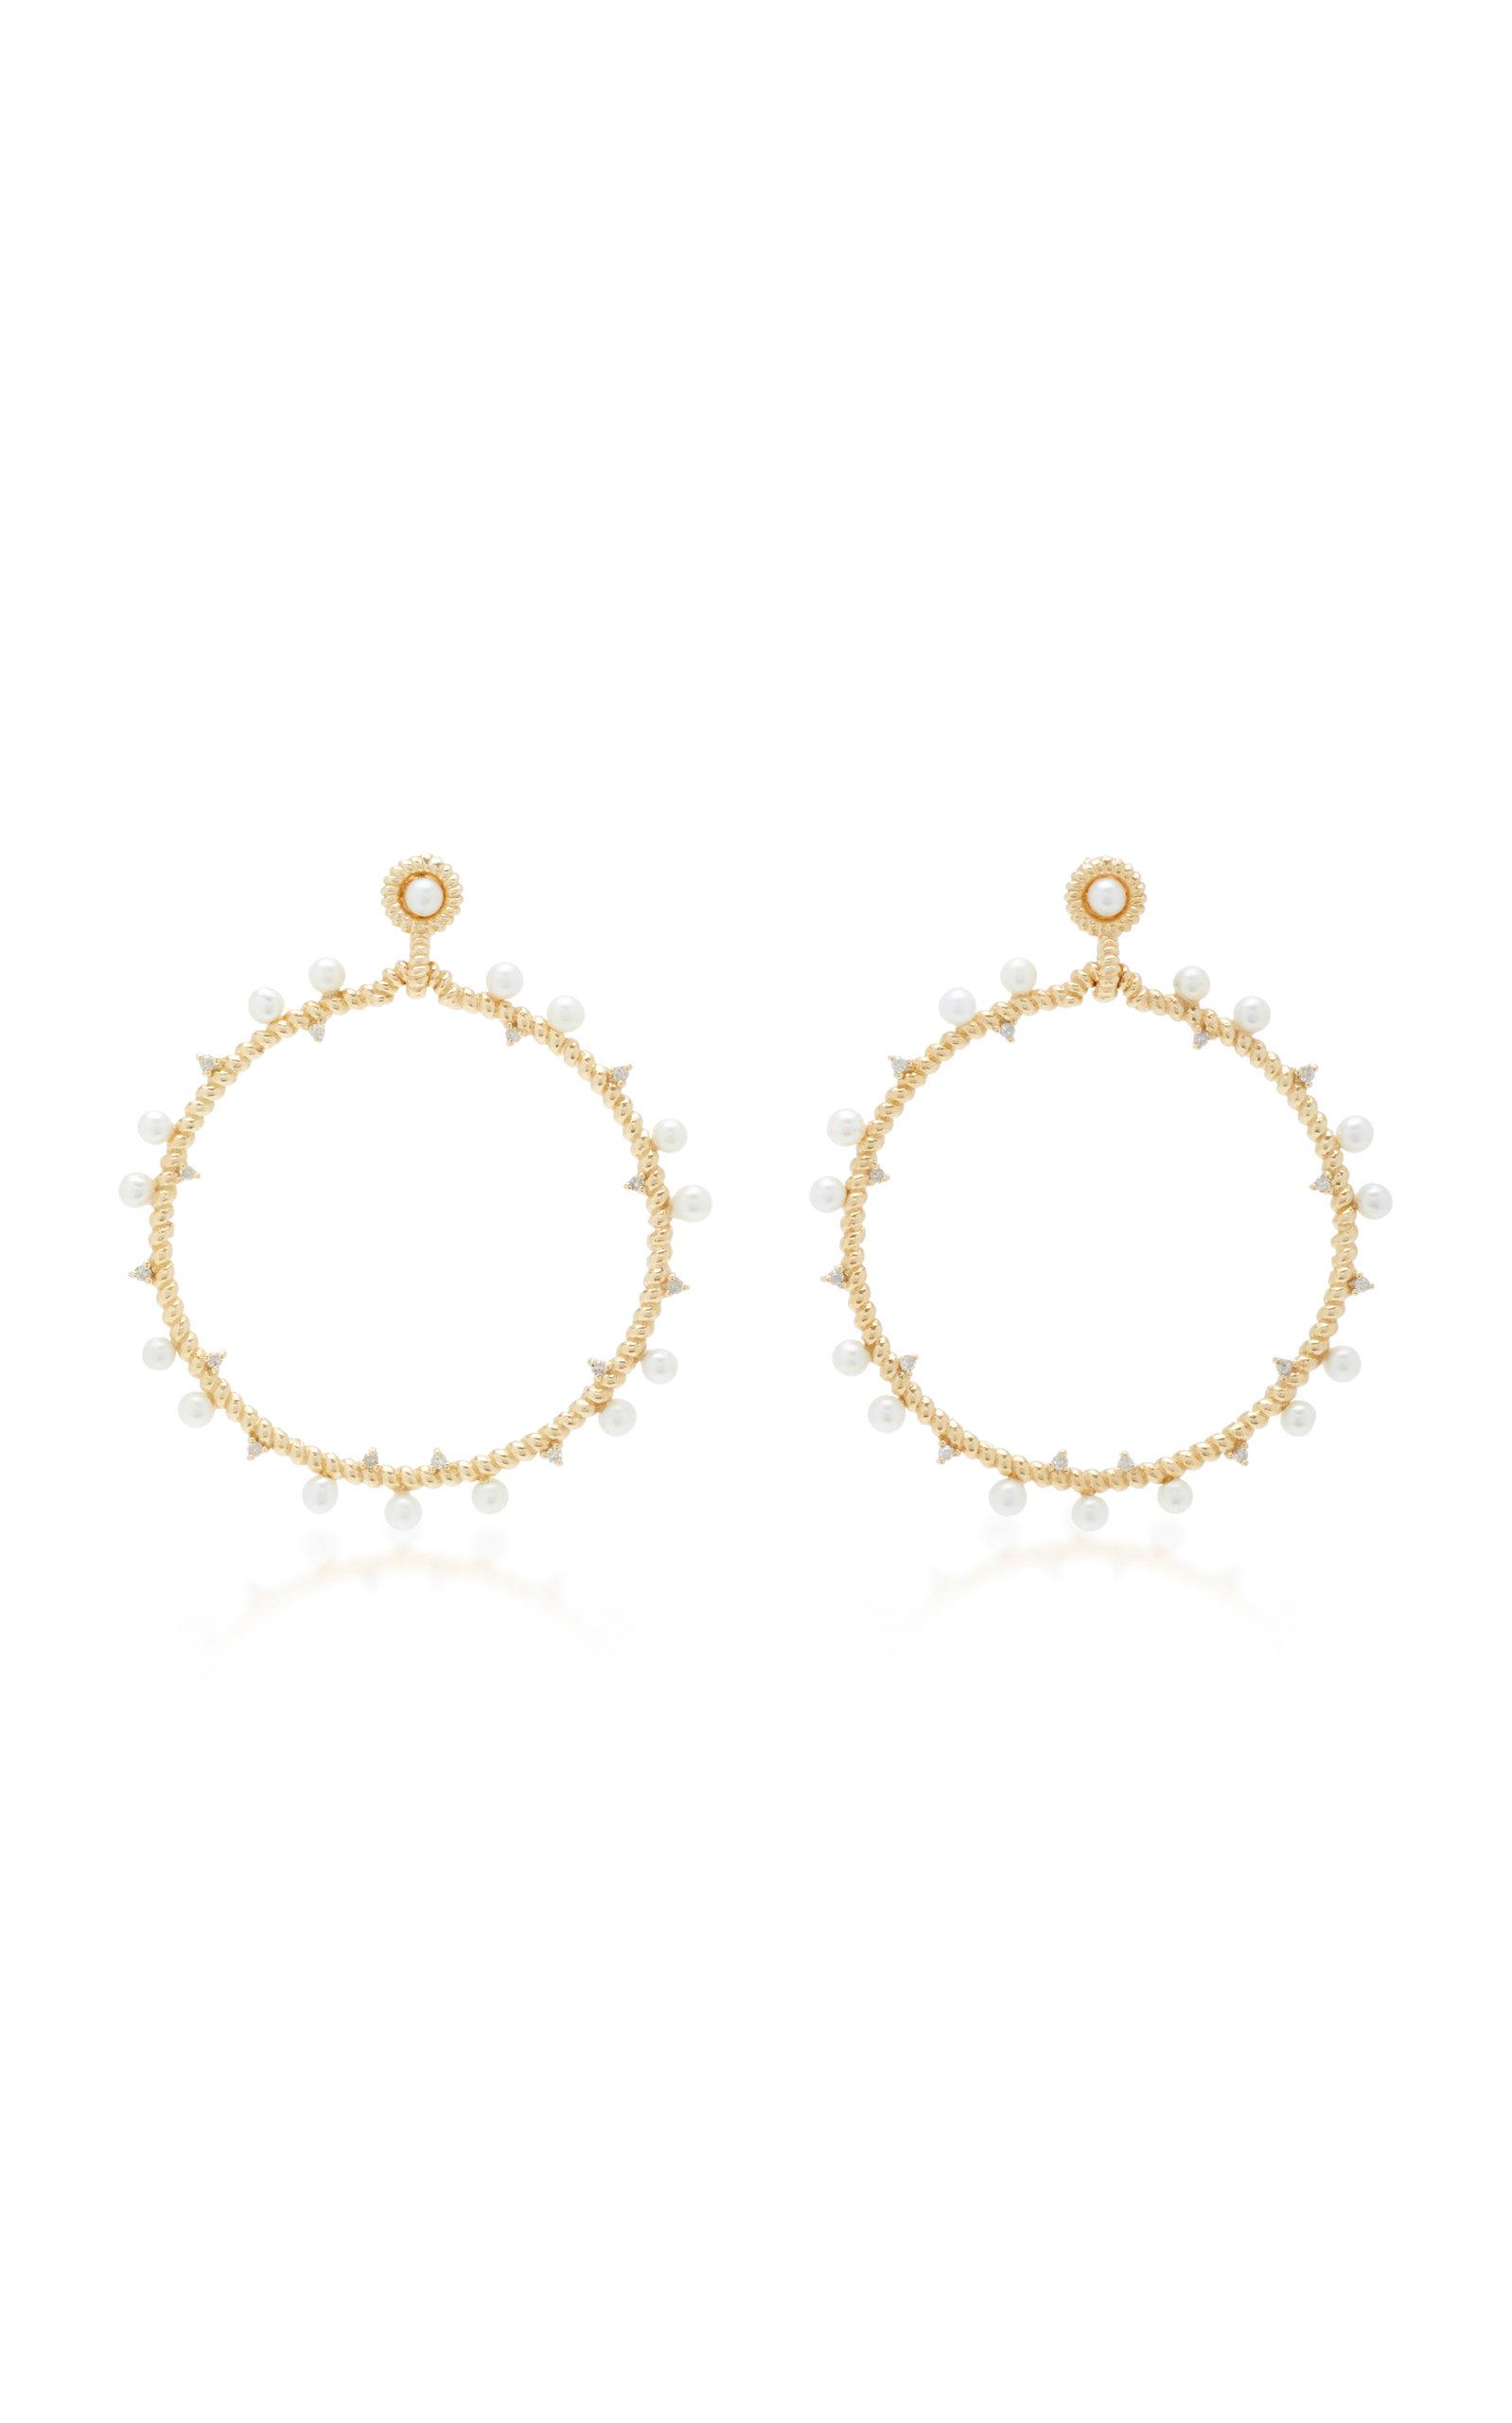 NANCY NEWBERG 14K Gold Pearl And Diamond Earrings